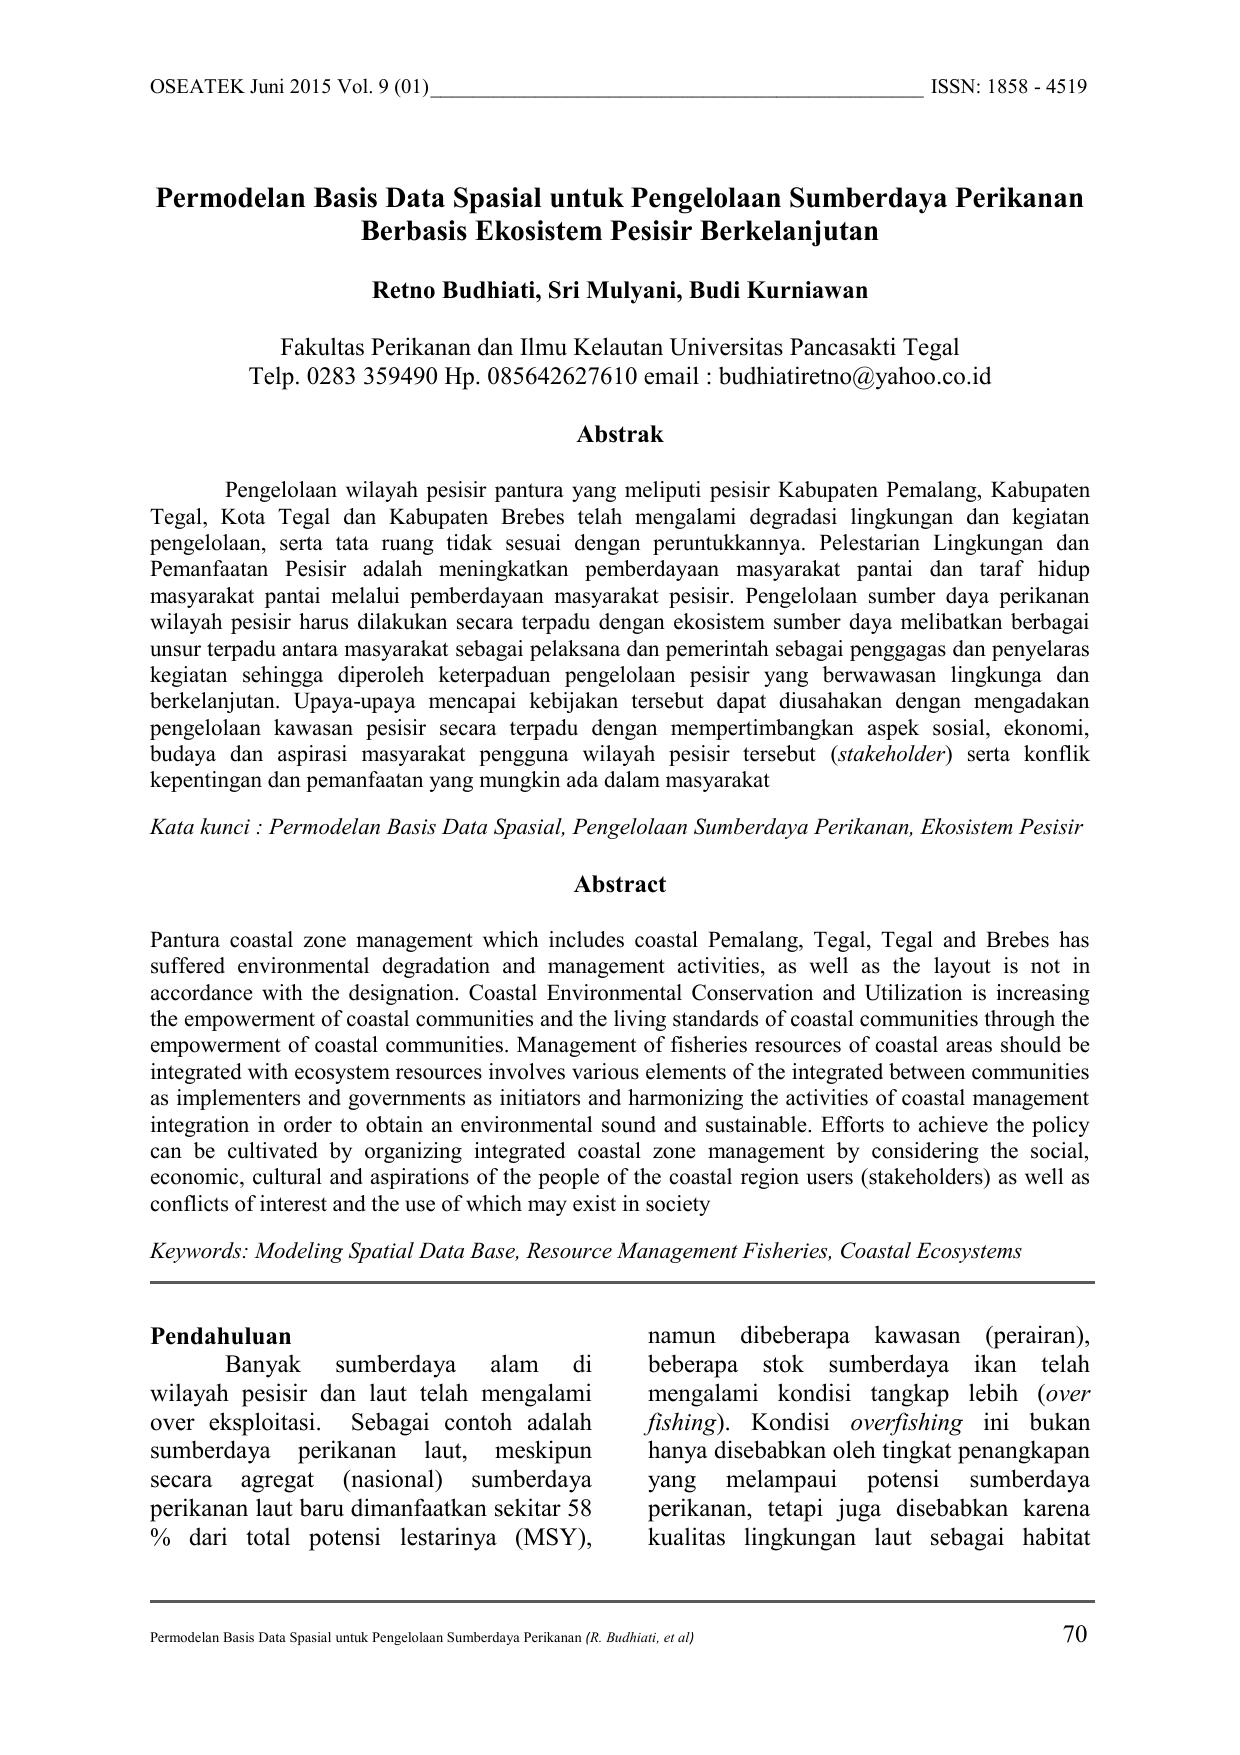 Permodelan Basis Data Spasial Untuk Pengelolaan